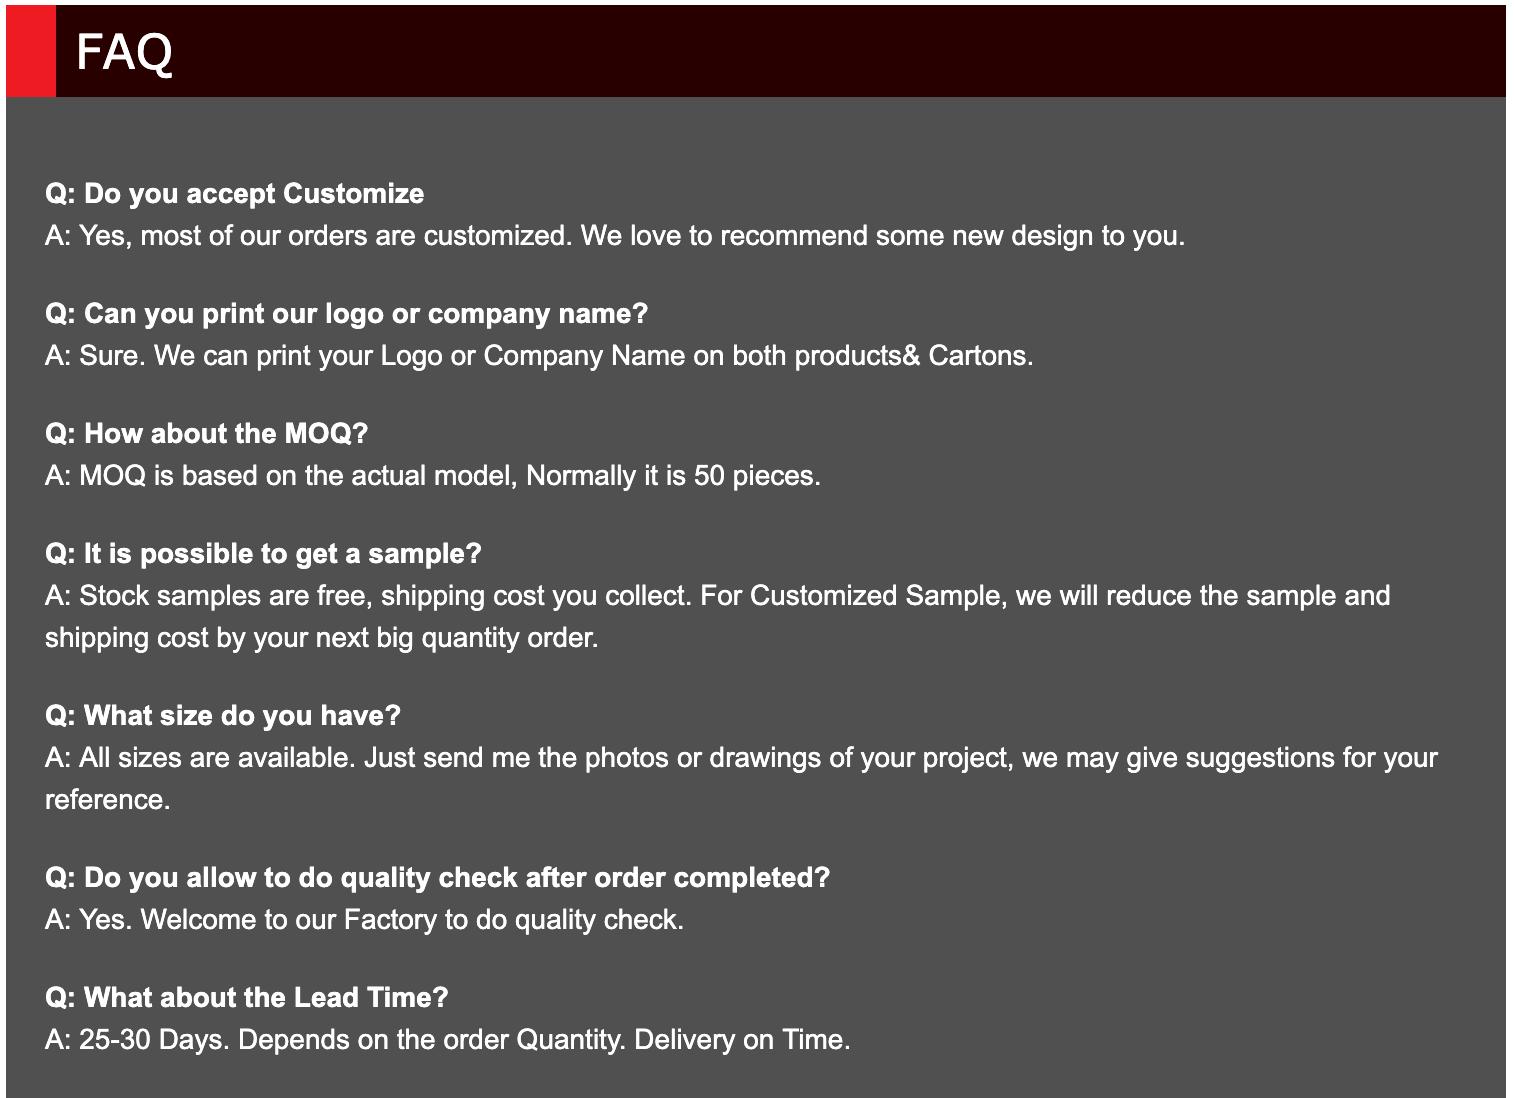 Wall Mirror Manufacturer FAQ